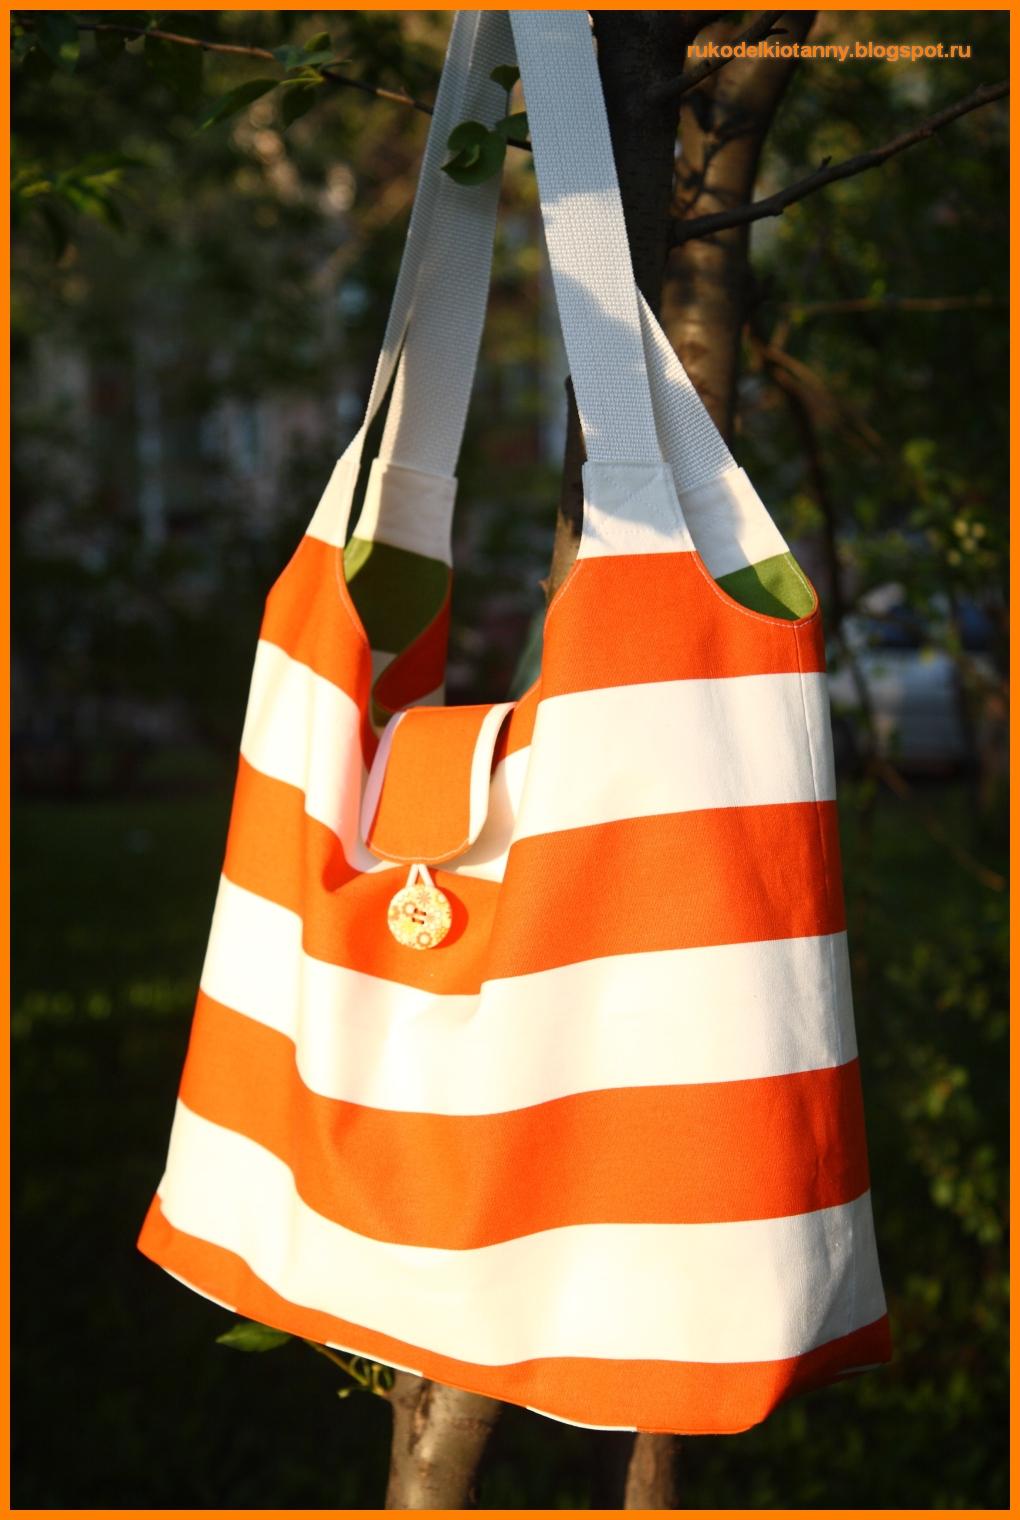 двусторонняя пляжная сумка